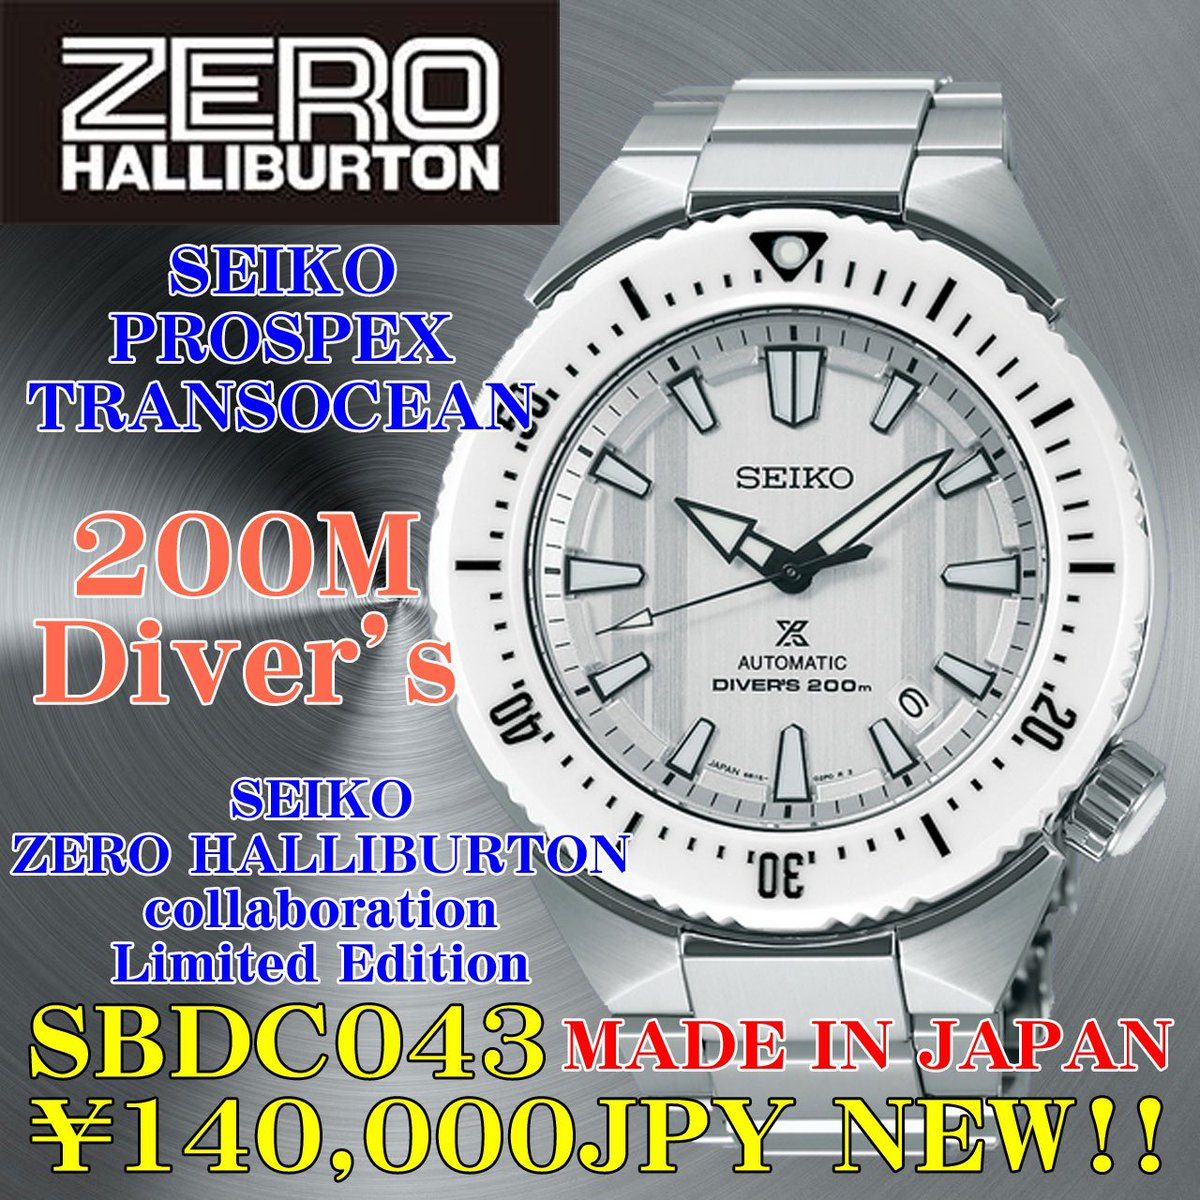 JAPAN SEIKO & ZERO HALLIBURTON Limited Edition 200M DIVER SBDC043 Automatic #ujiiejapan https://bit.ly/2nZWwzg    #ebay https://ebay.to/2G0A8l4    #japan #seiko #zero_halliburton #limited #automatic #watch #200m #diver #popular